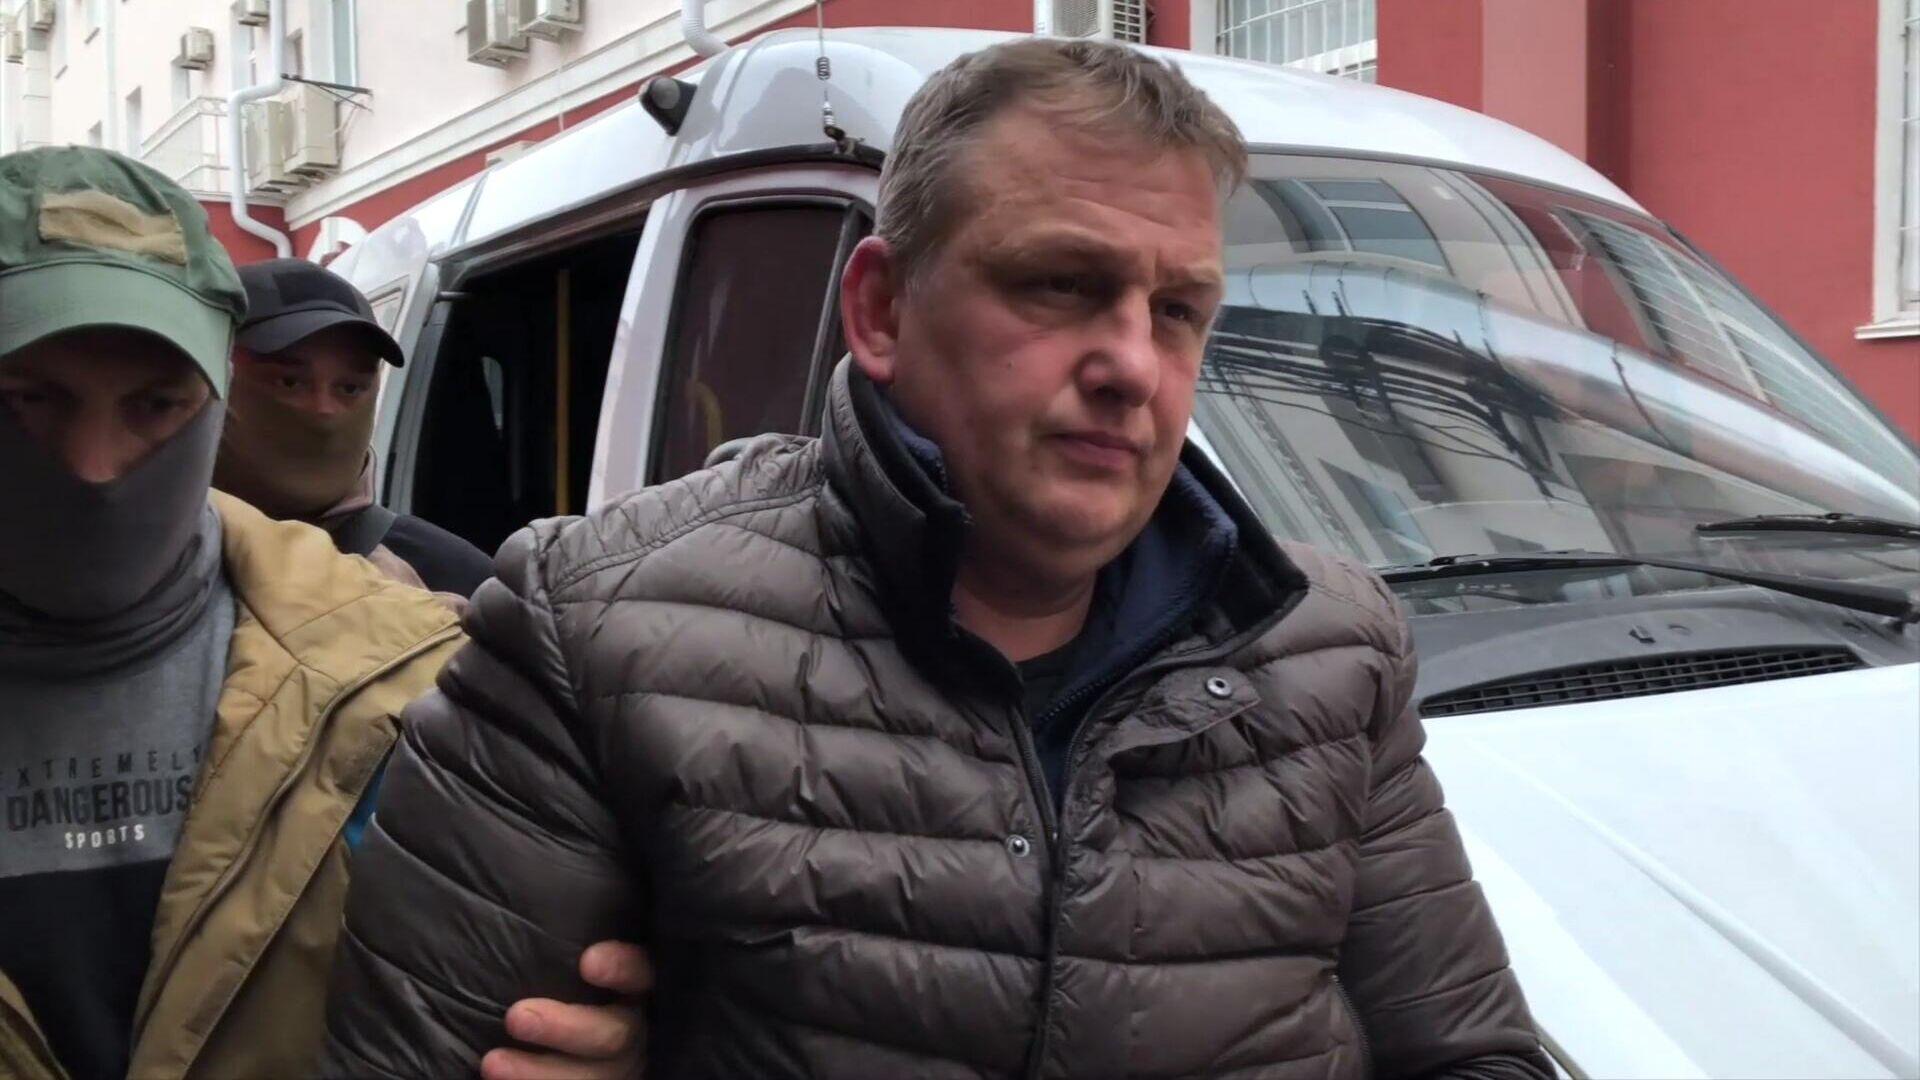 El ciudadano ruso Esipenko V.L. detenido en Crimea por espiar para Ucrania - Sputnik Mundo, 1920, 16.03.2021